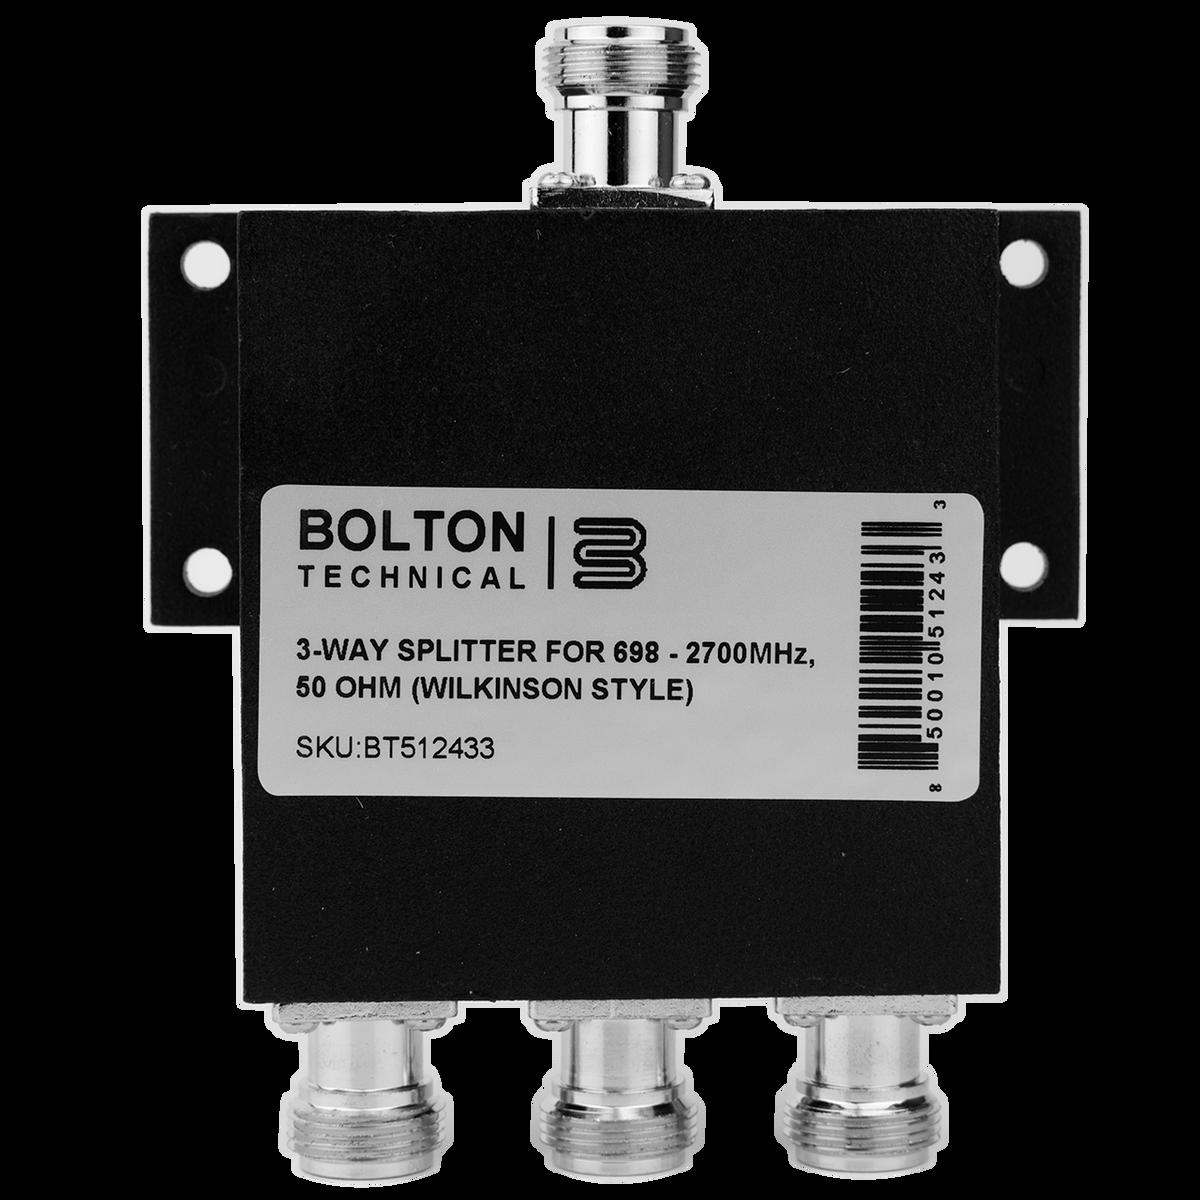 Bolton Technical Low-PIM 3-Way Splitter 698-2700Mhz 50 Ohm (Wilkinson Style)